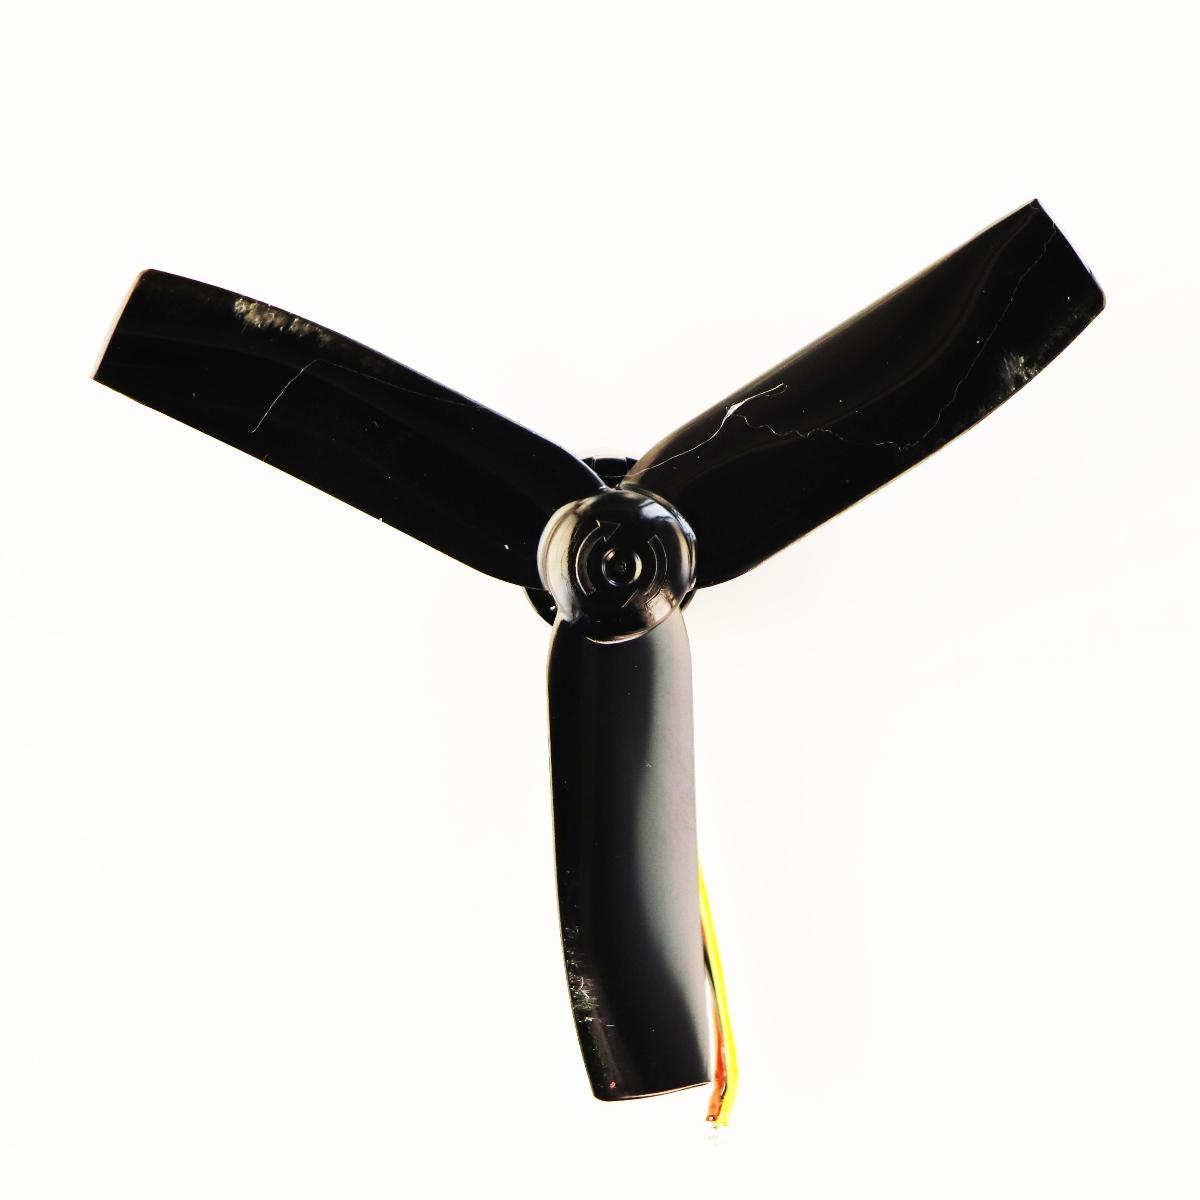 Original Rova Selfie Drone Replacement Part Counter Clockwise Propeller - Black